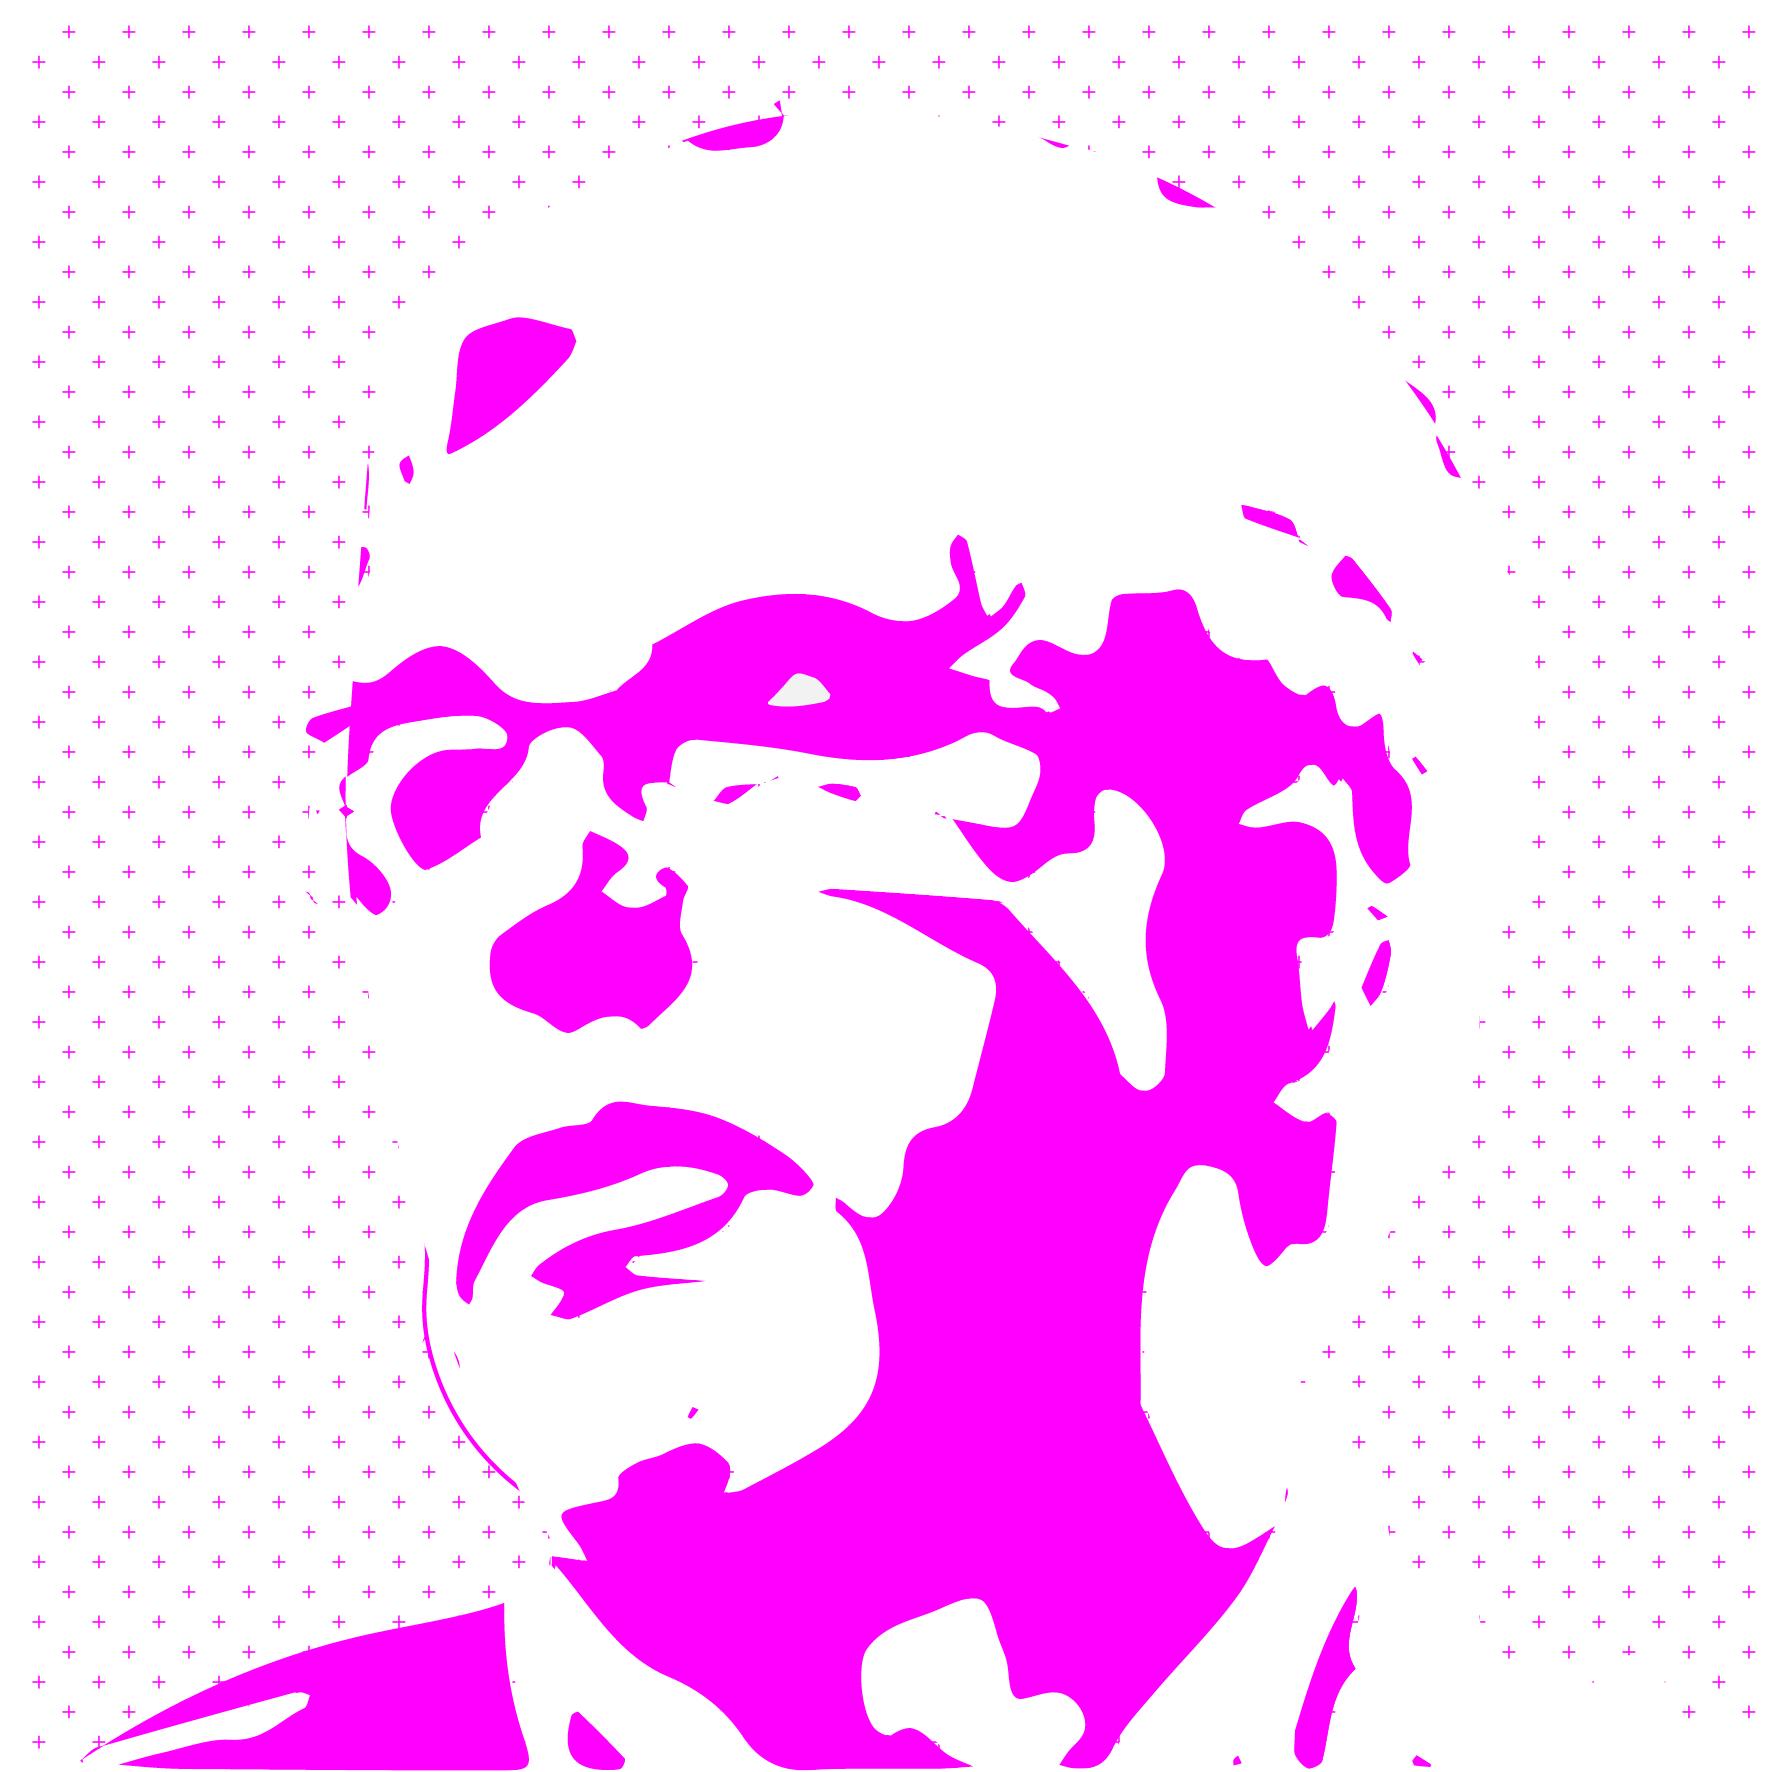 Andre Brown - Professor Interdisciplinary Design